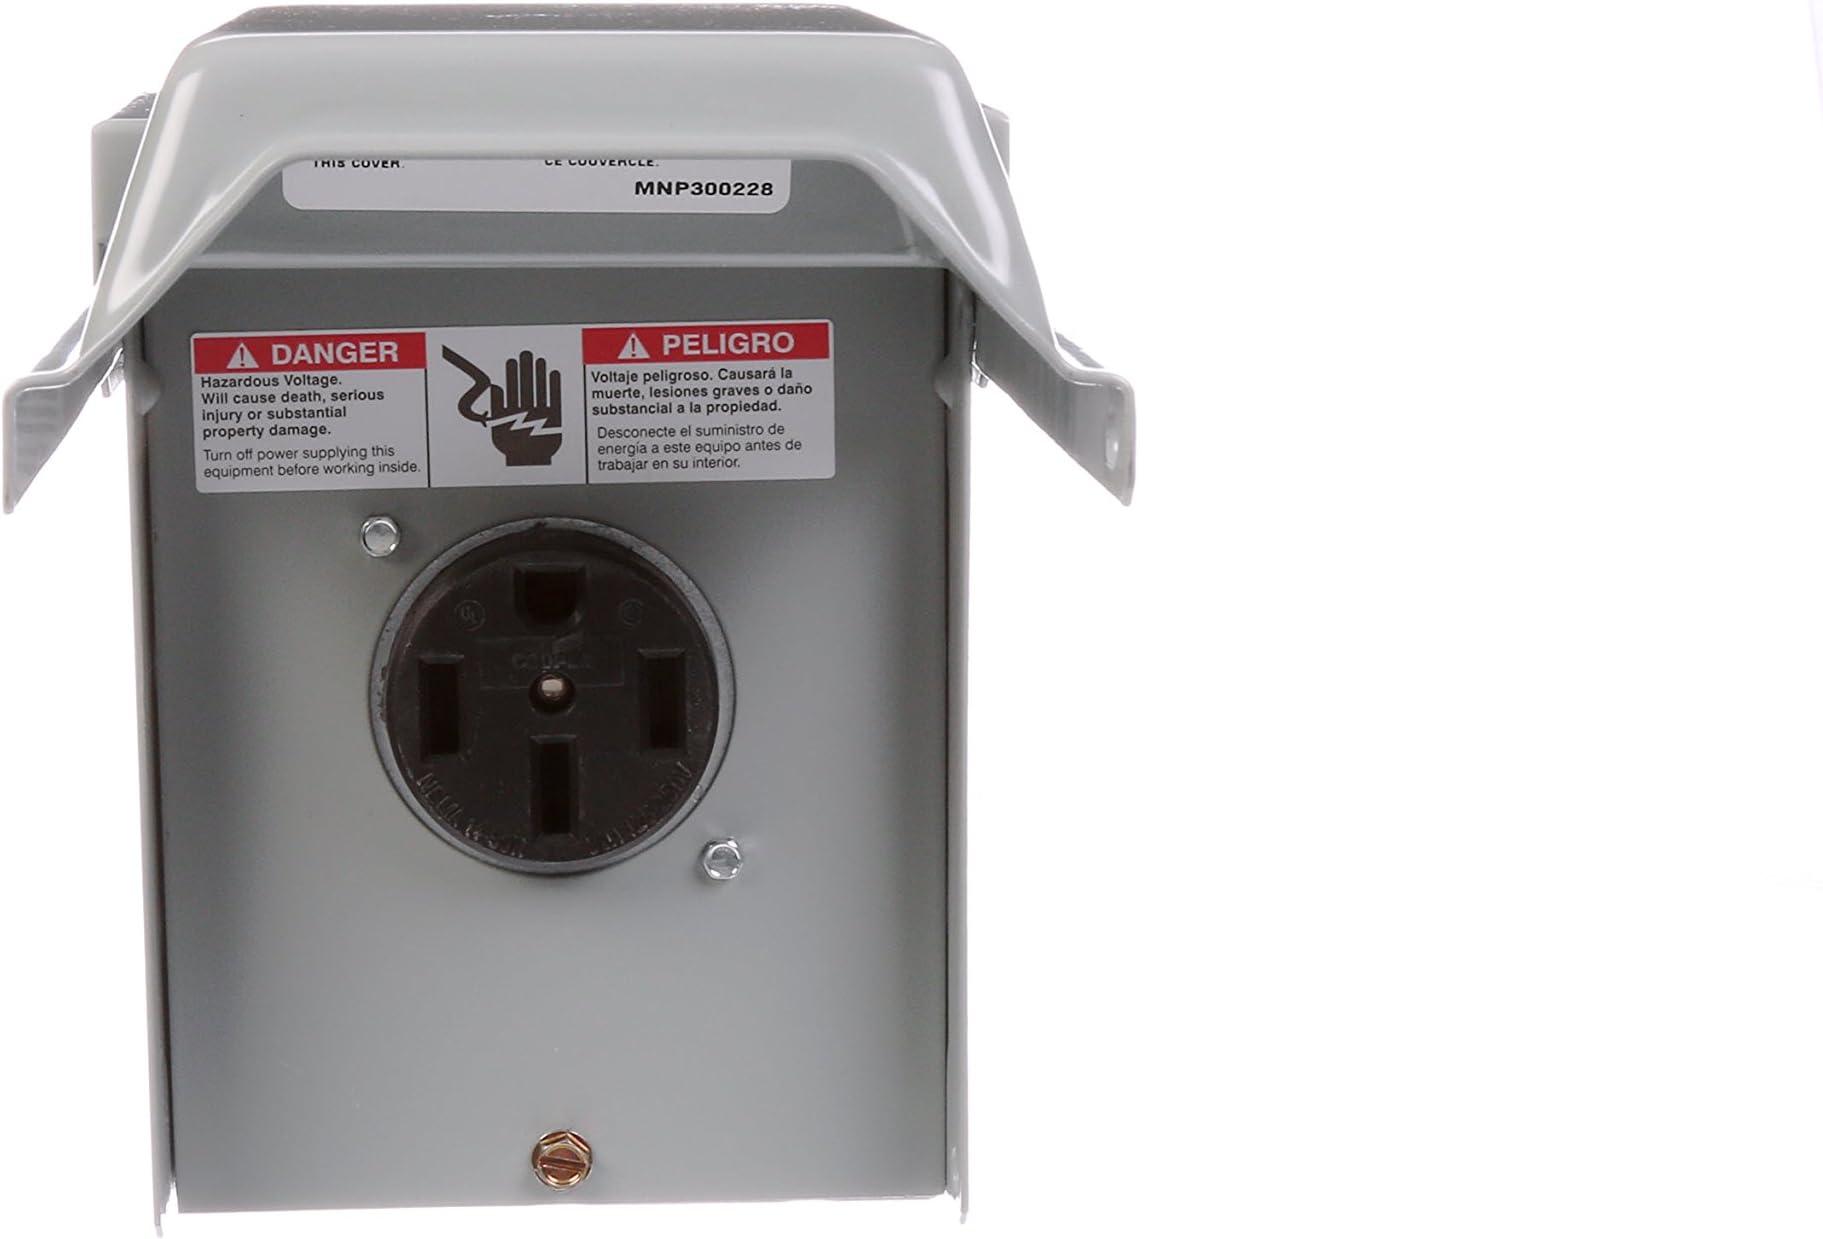 Westinghouse Fuse Box Door Hinge Wiring Diagrams Circuit Breaker Panels Amazon Com Electrical Breakers Load Washer